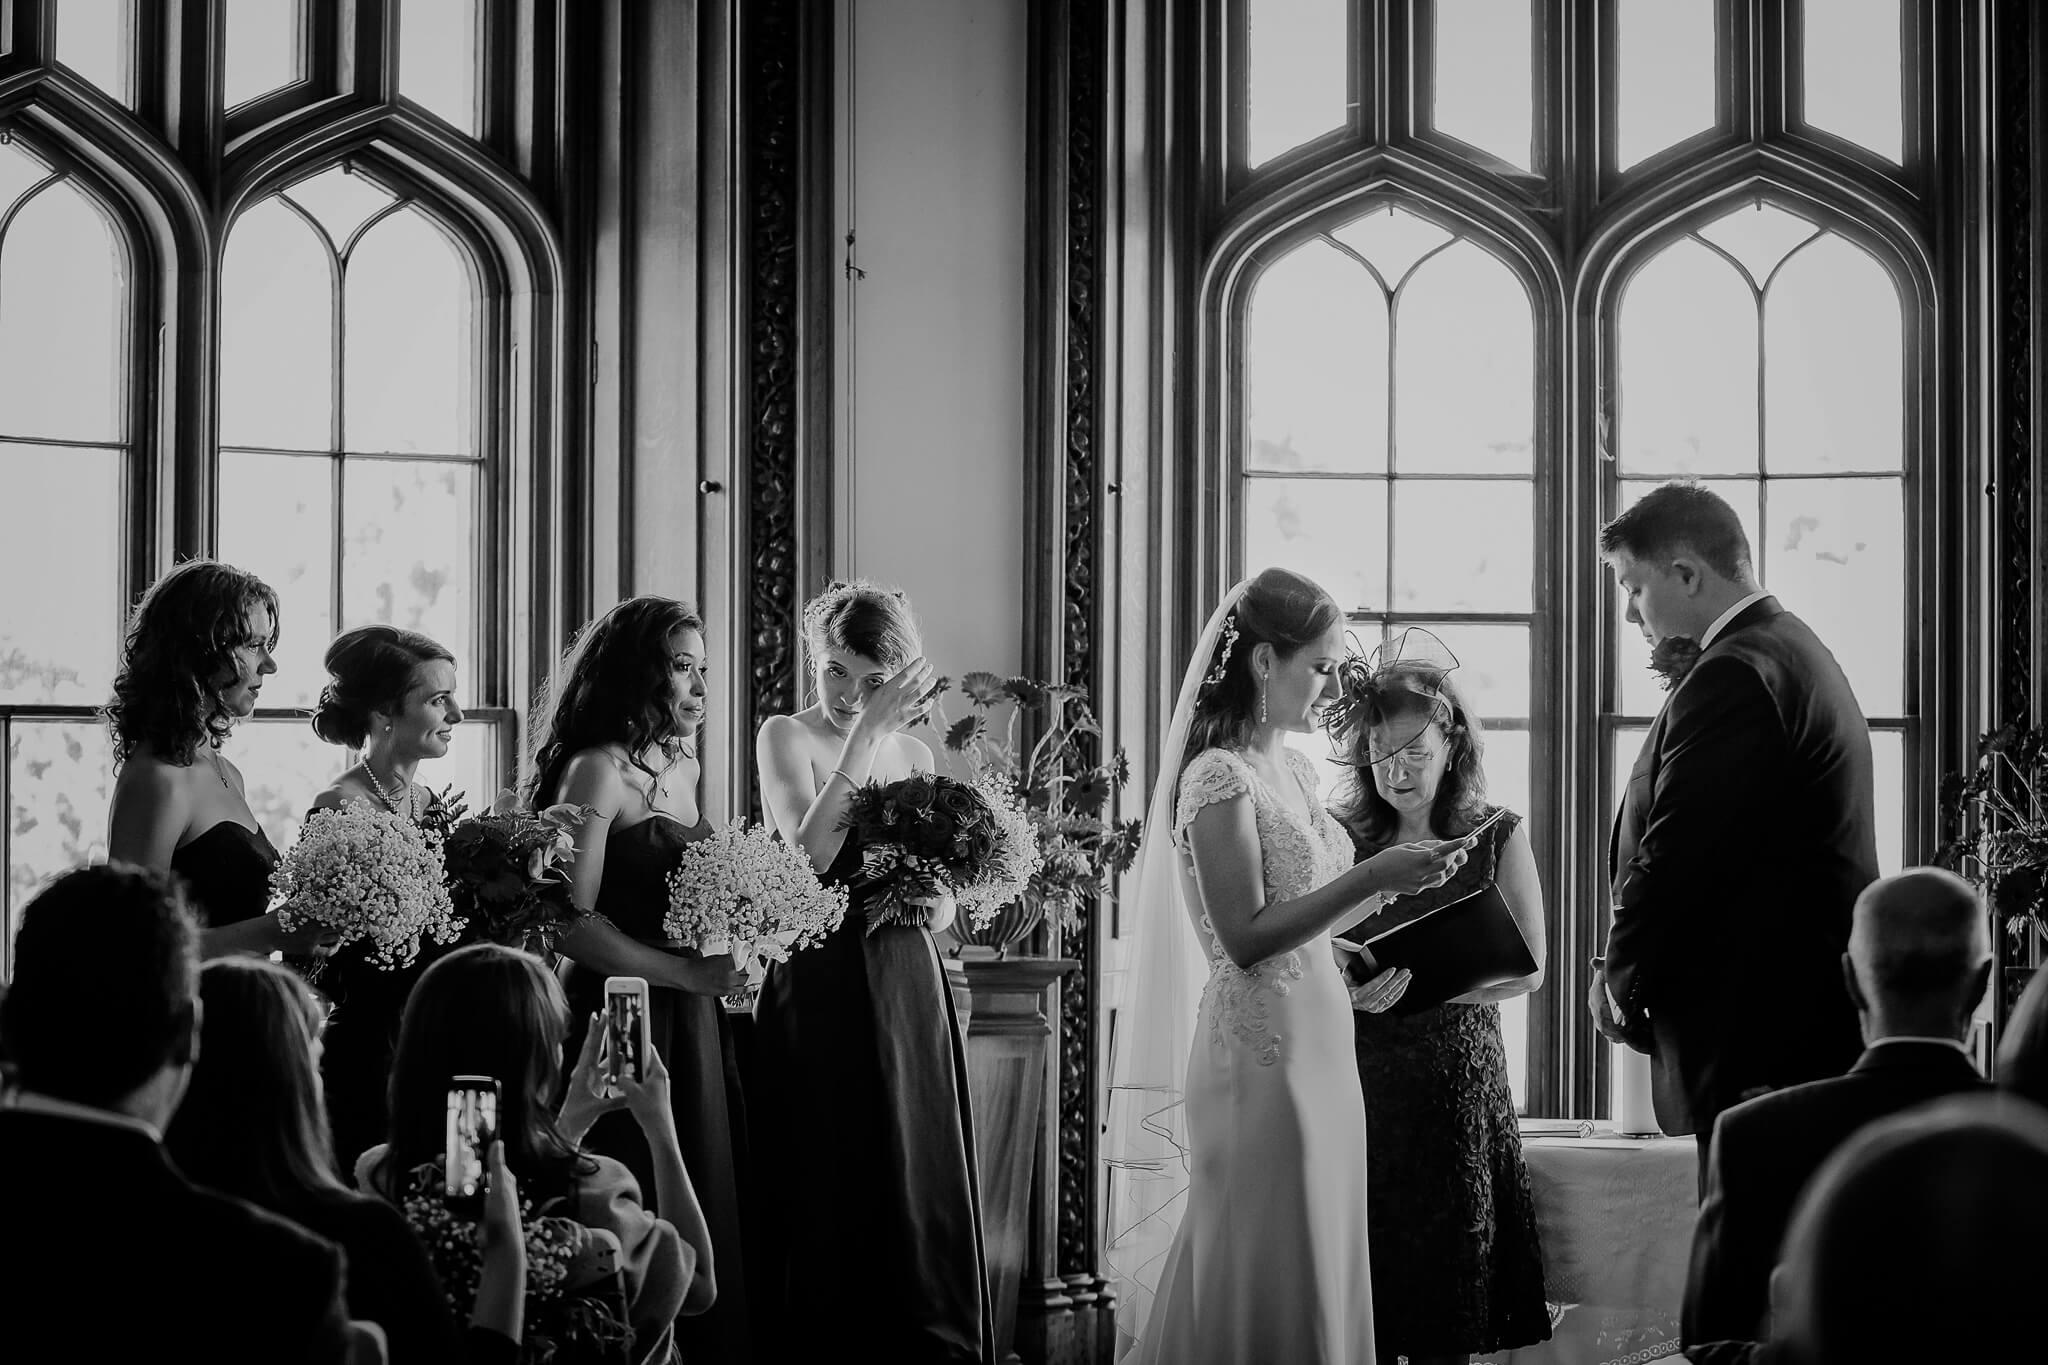 duns-castle-wedding-photograper-scotland-stanbury-photography-009a